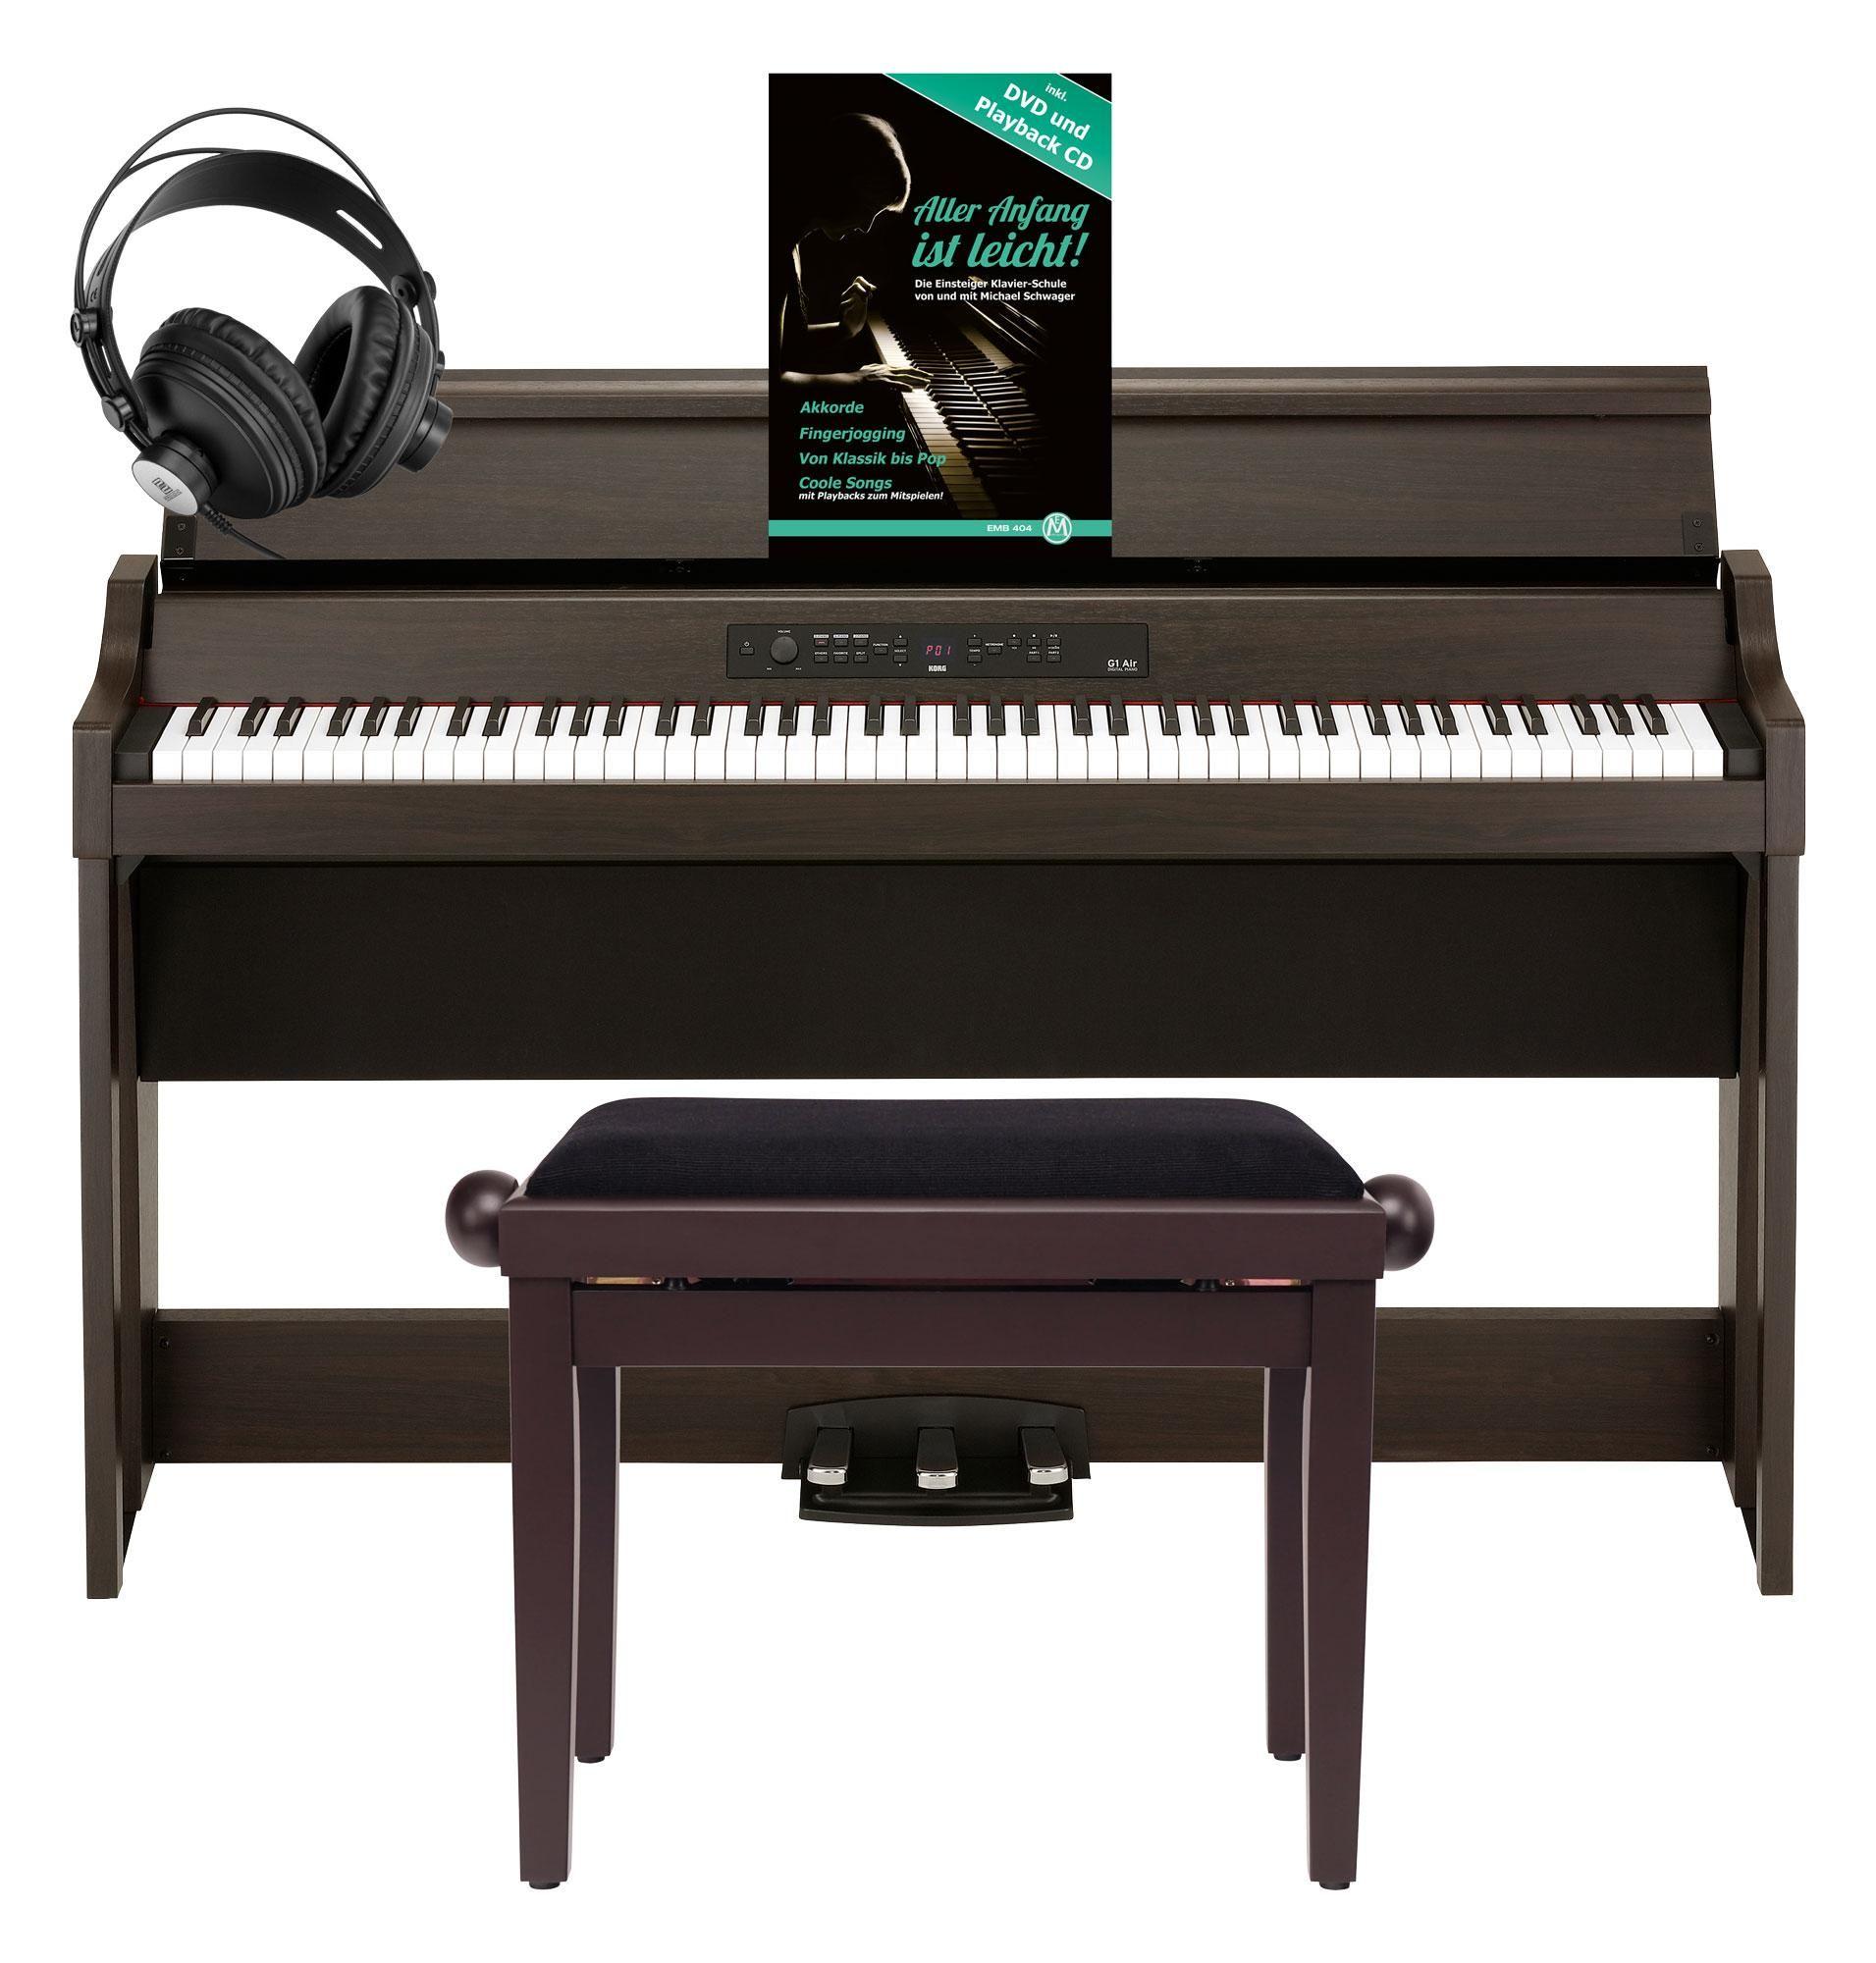 G1 Air BR Digitalpiano Braun Konzertflügel